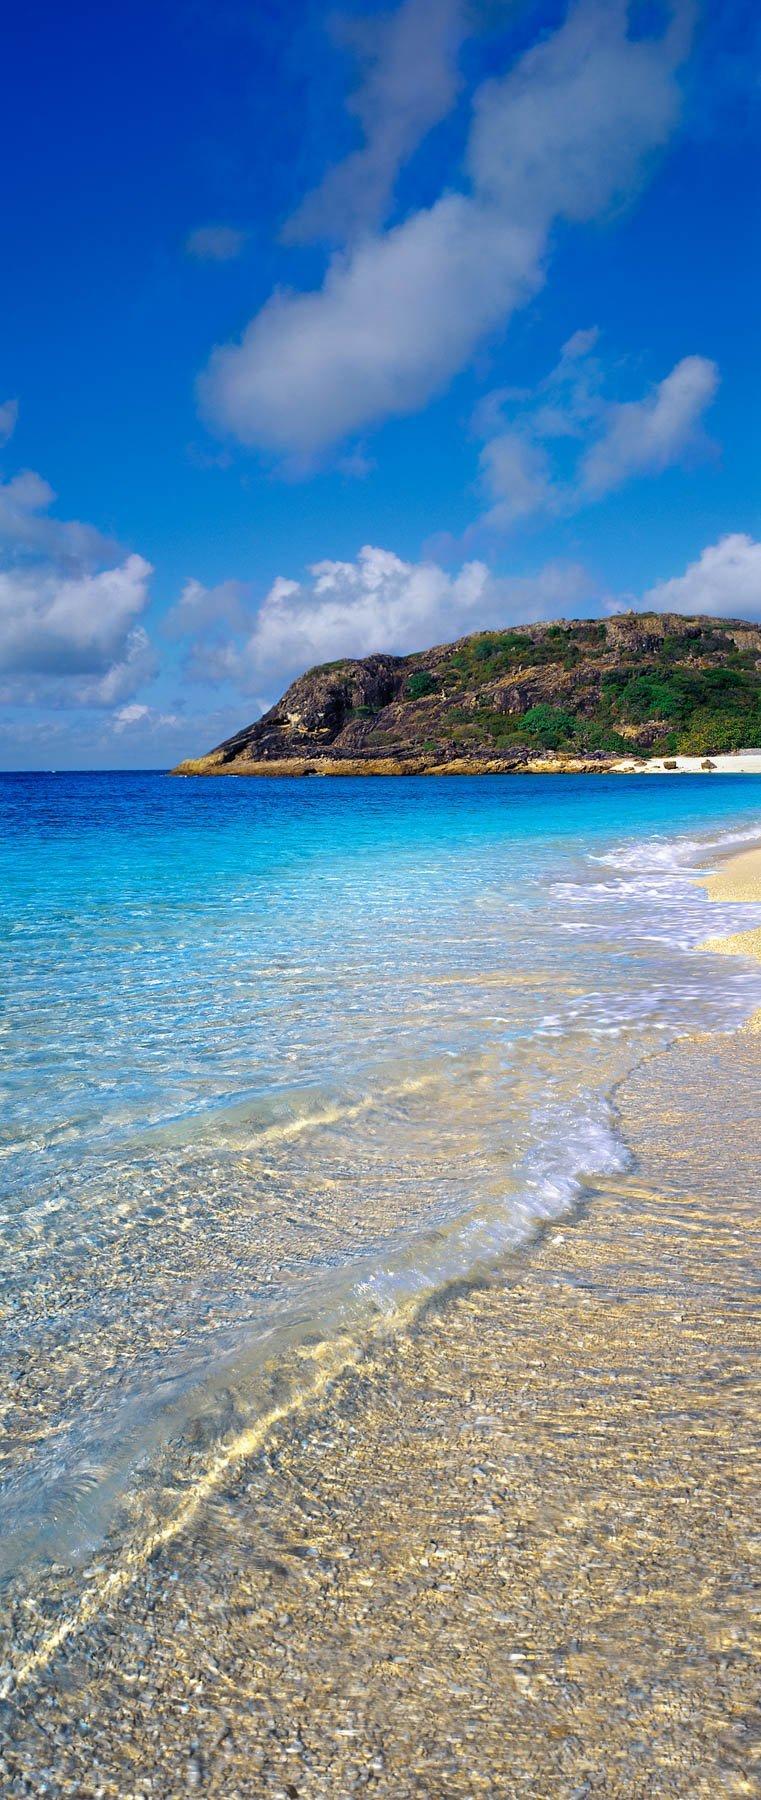 Tranquil Getaway, QLD